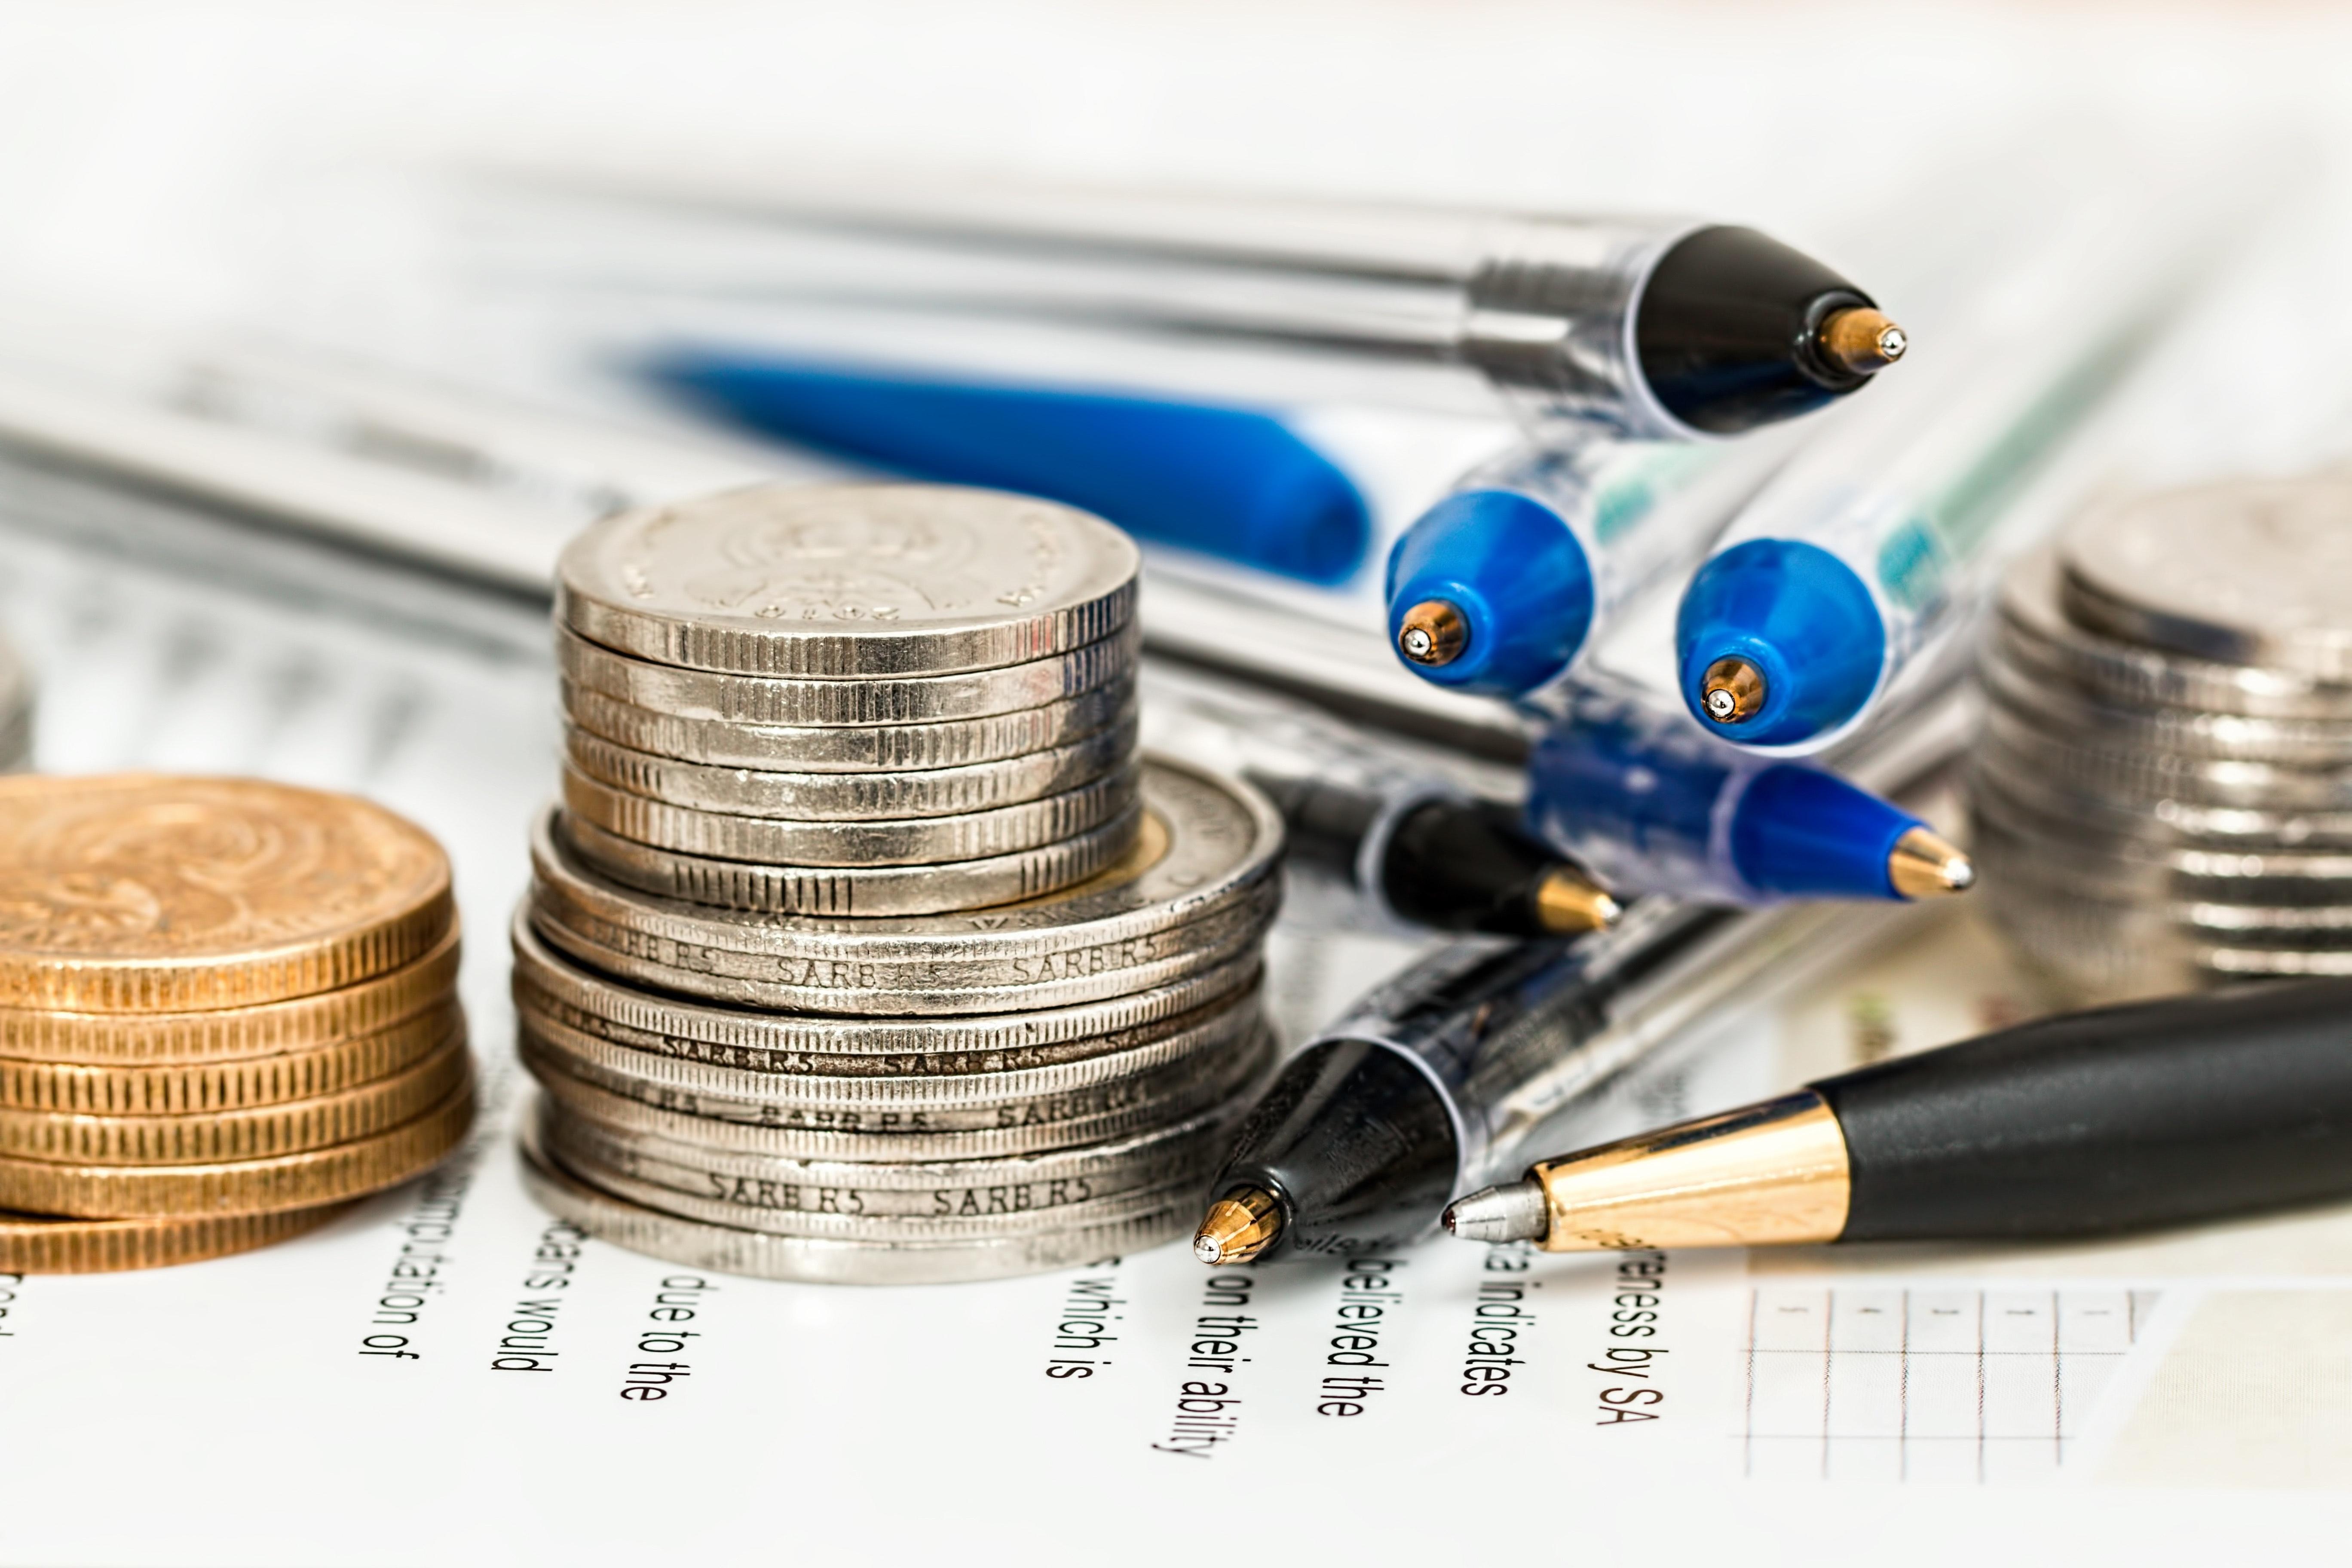 2021 Introduction to Anti-Money Laundering and Terrorist Financing Legislation